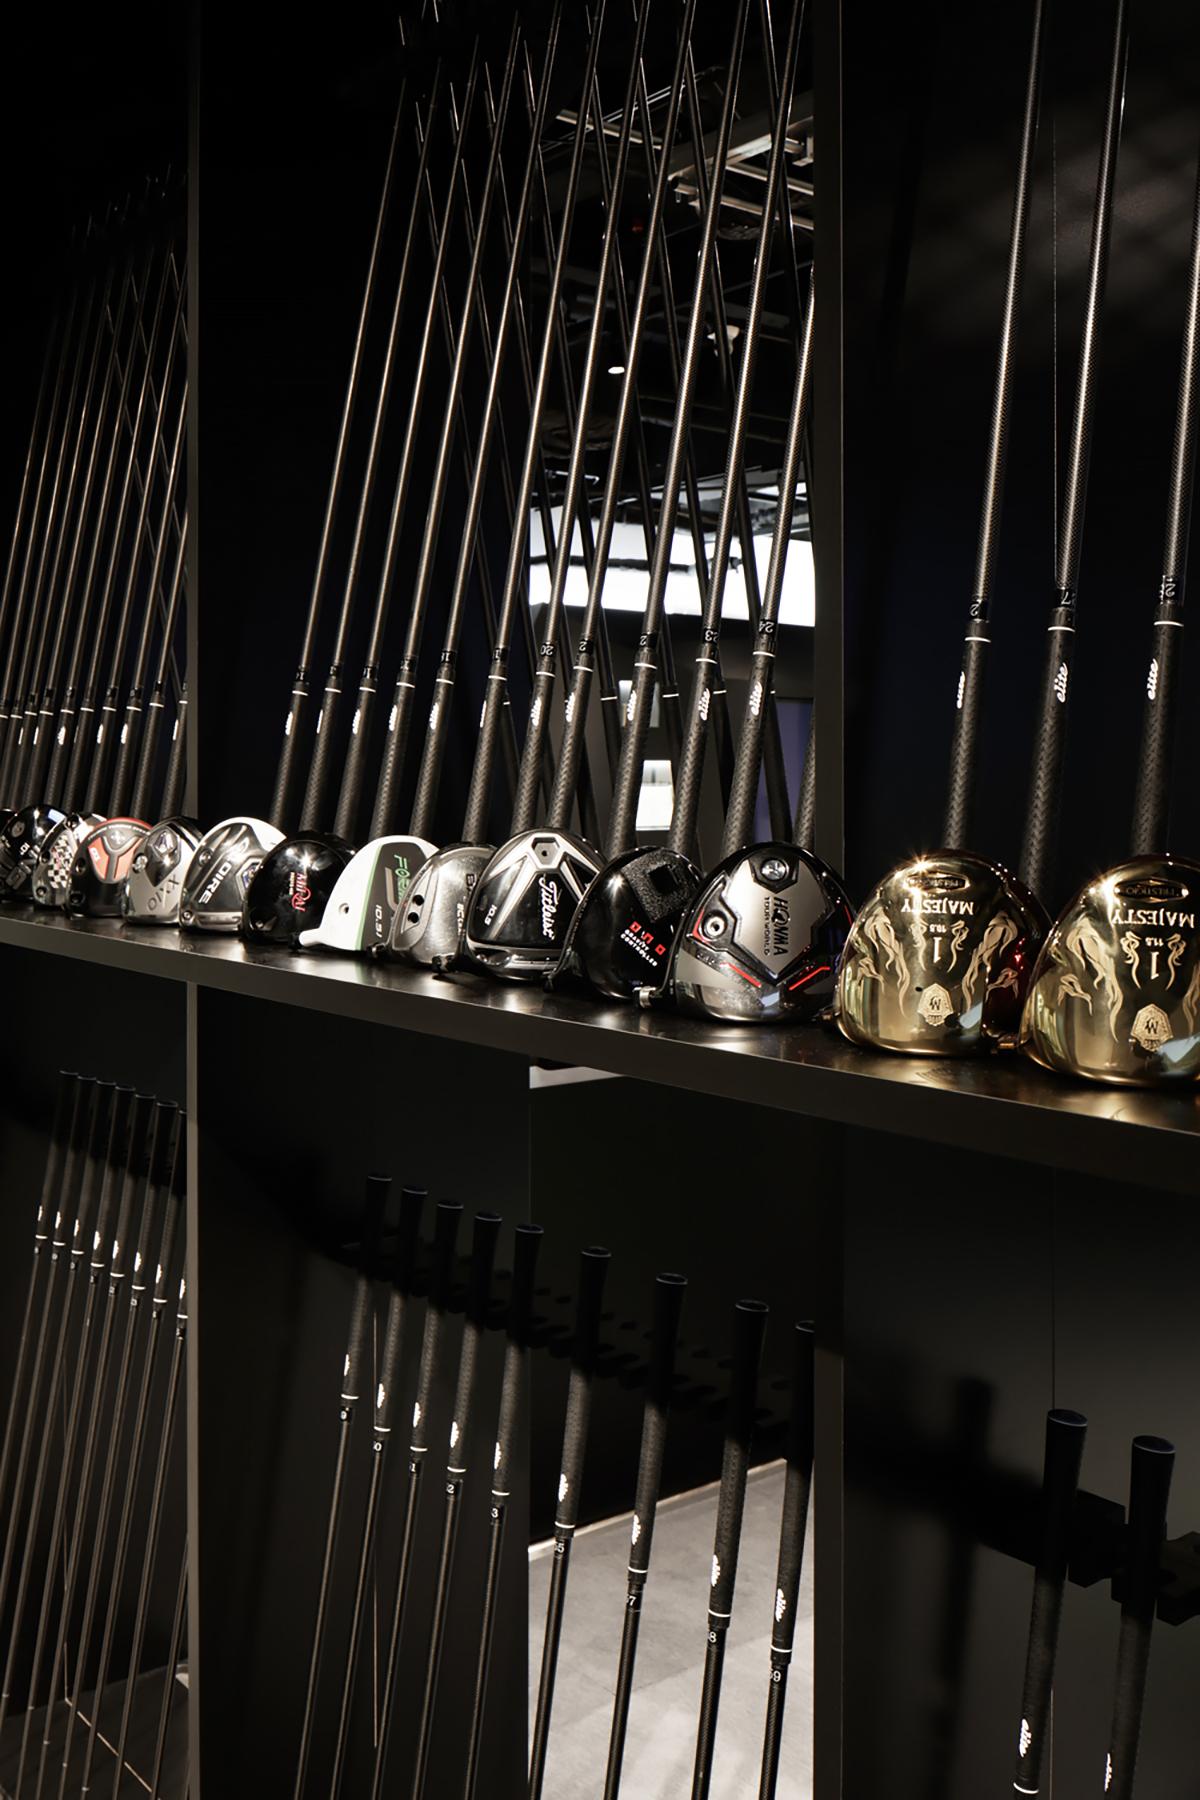 Seven Dreamers Golf Shafts5